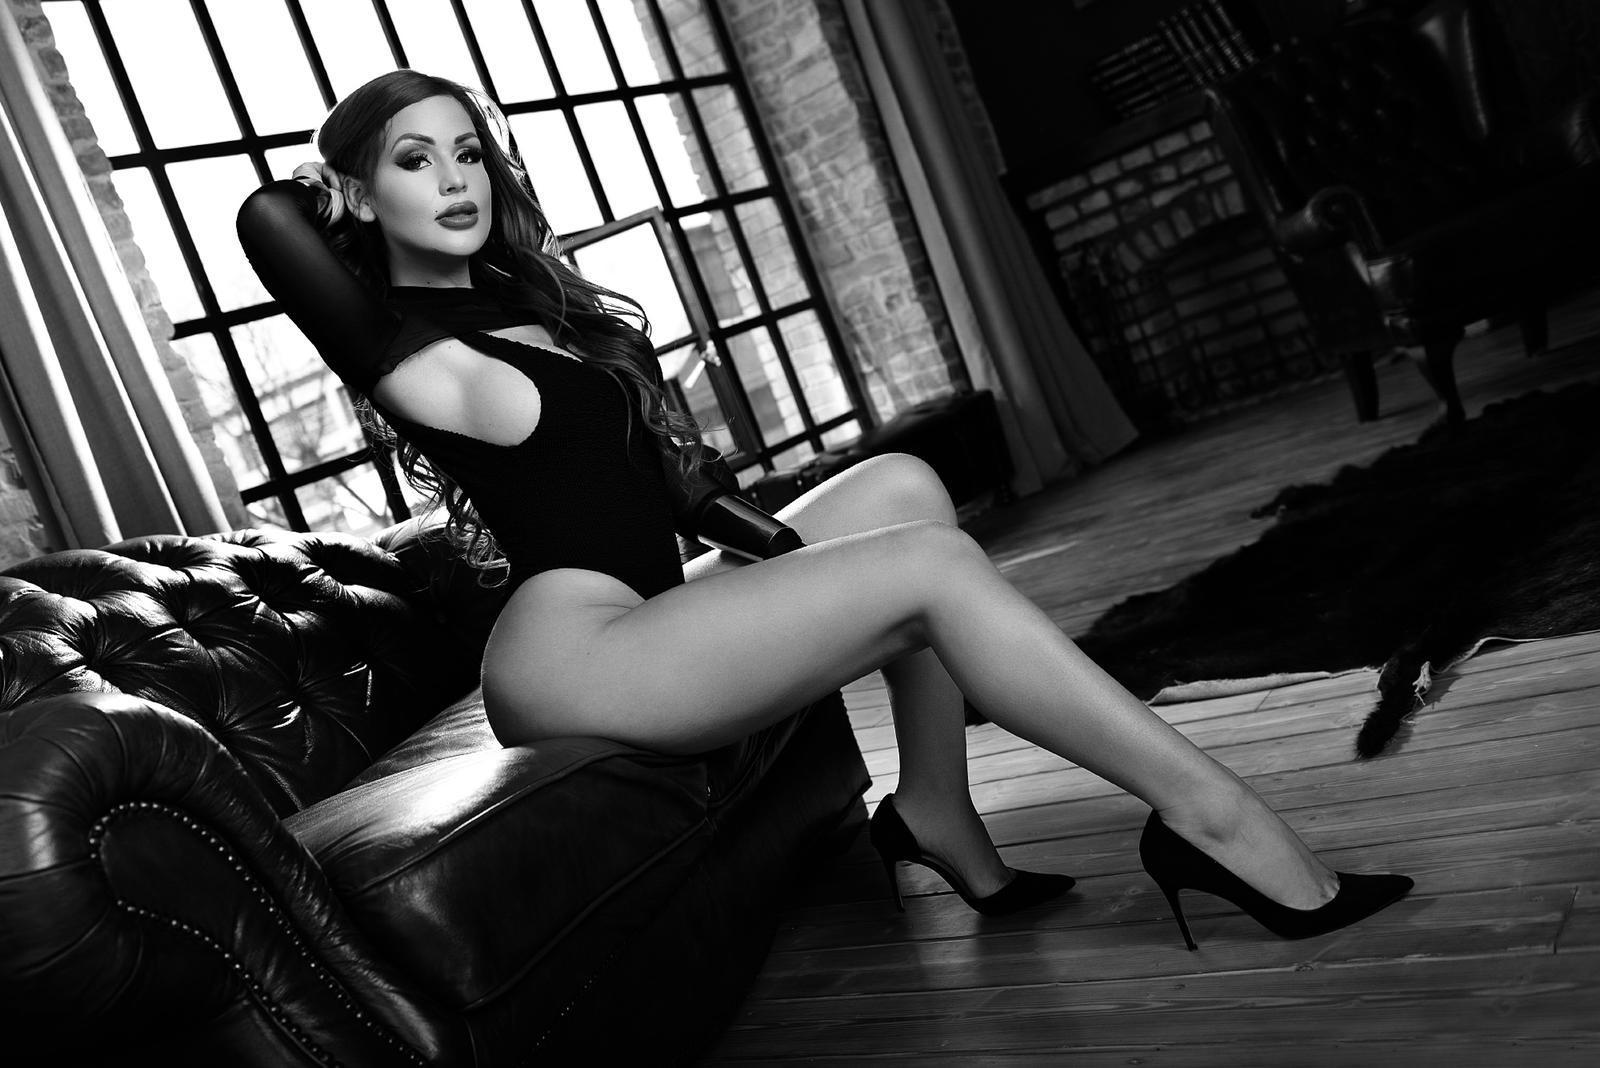 Melanie from City 48